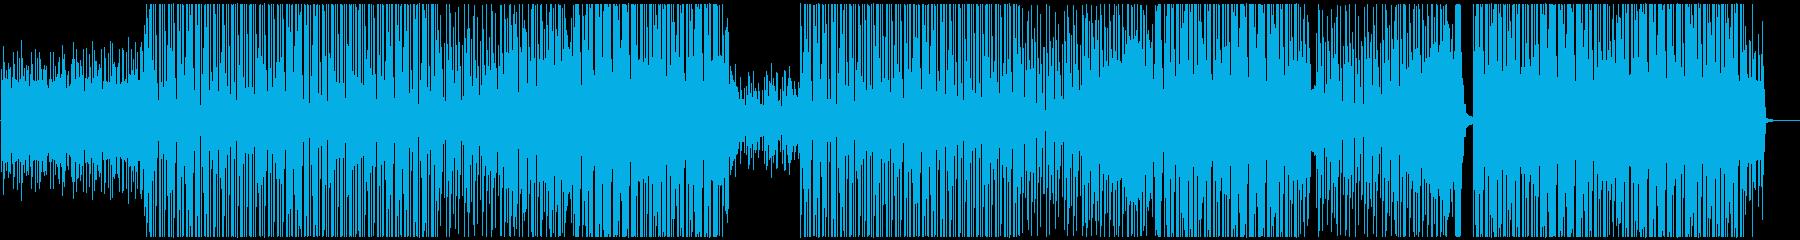 K-Pop、レゲトン、ラテン、ポップス♪の再生済みの波形